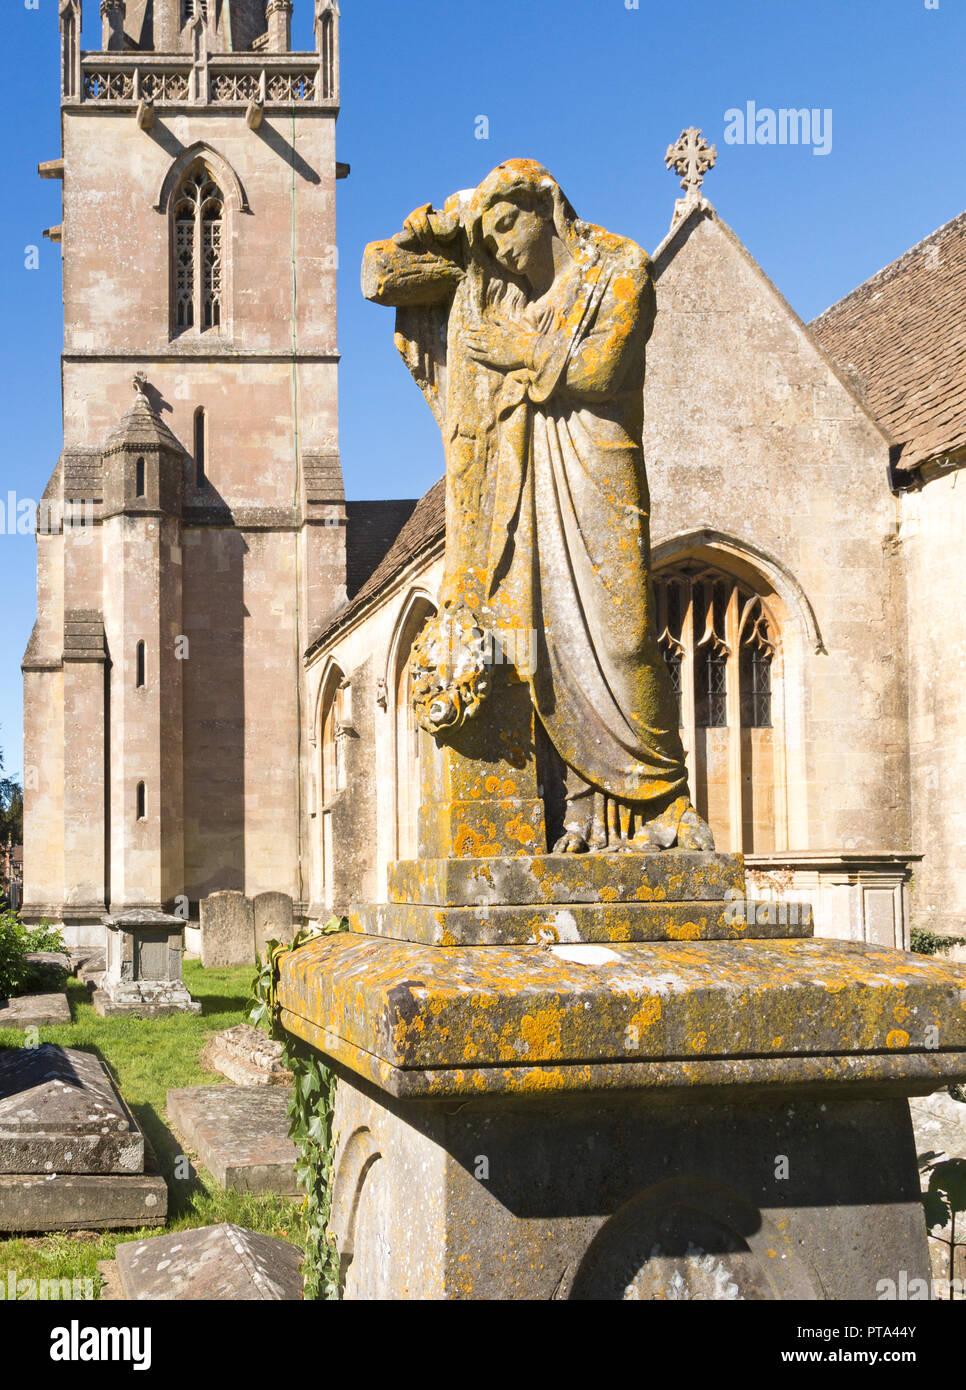 Statue on grave in graveyard of Church of Saint Bartholomew, Corsham, Wiltshire, England, UK Stock Photo